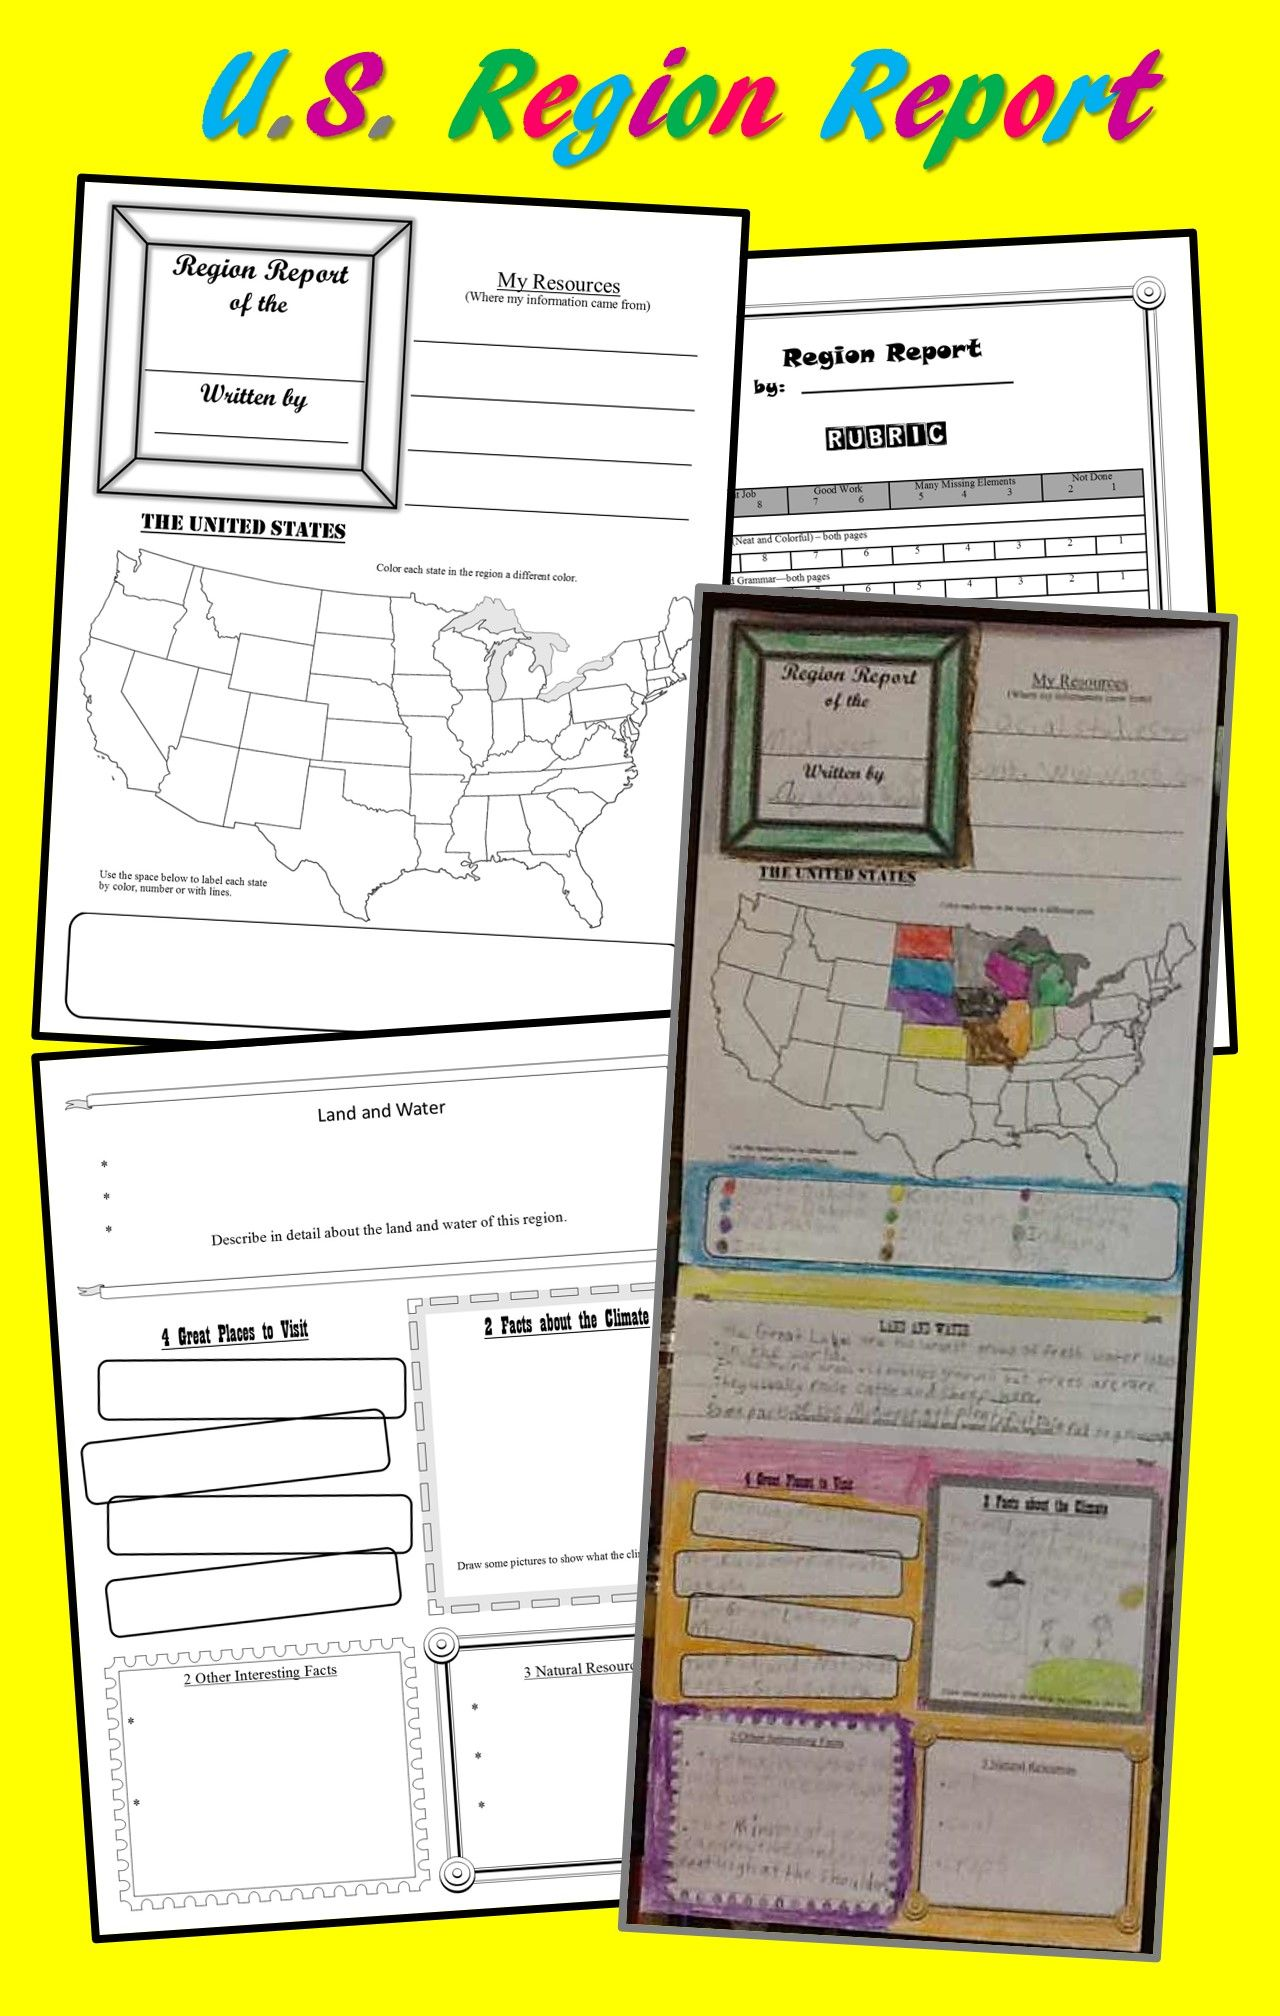 small resolution of U.S. Region Report (Poster) Template for Intermediate Grades   Homeschool social  studies